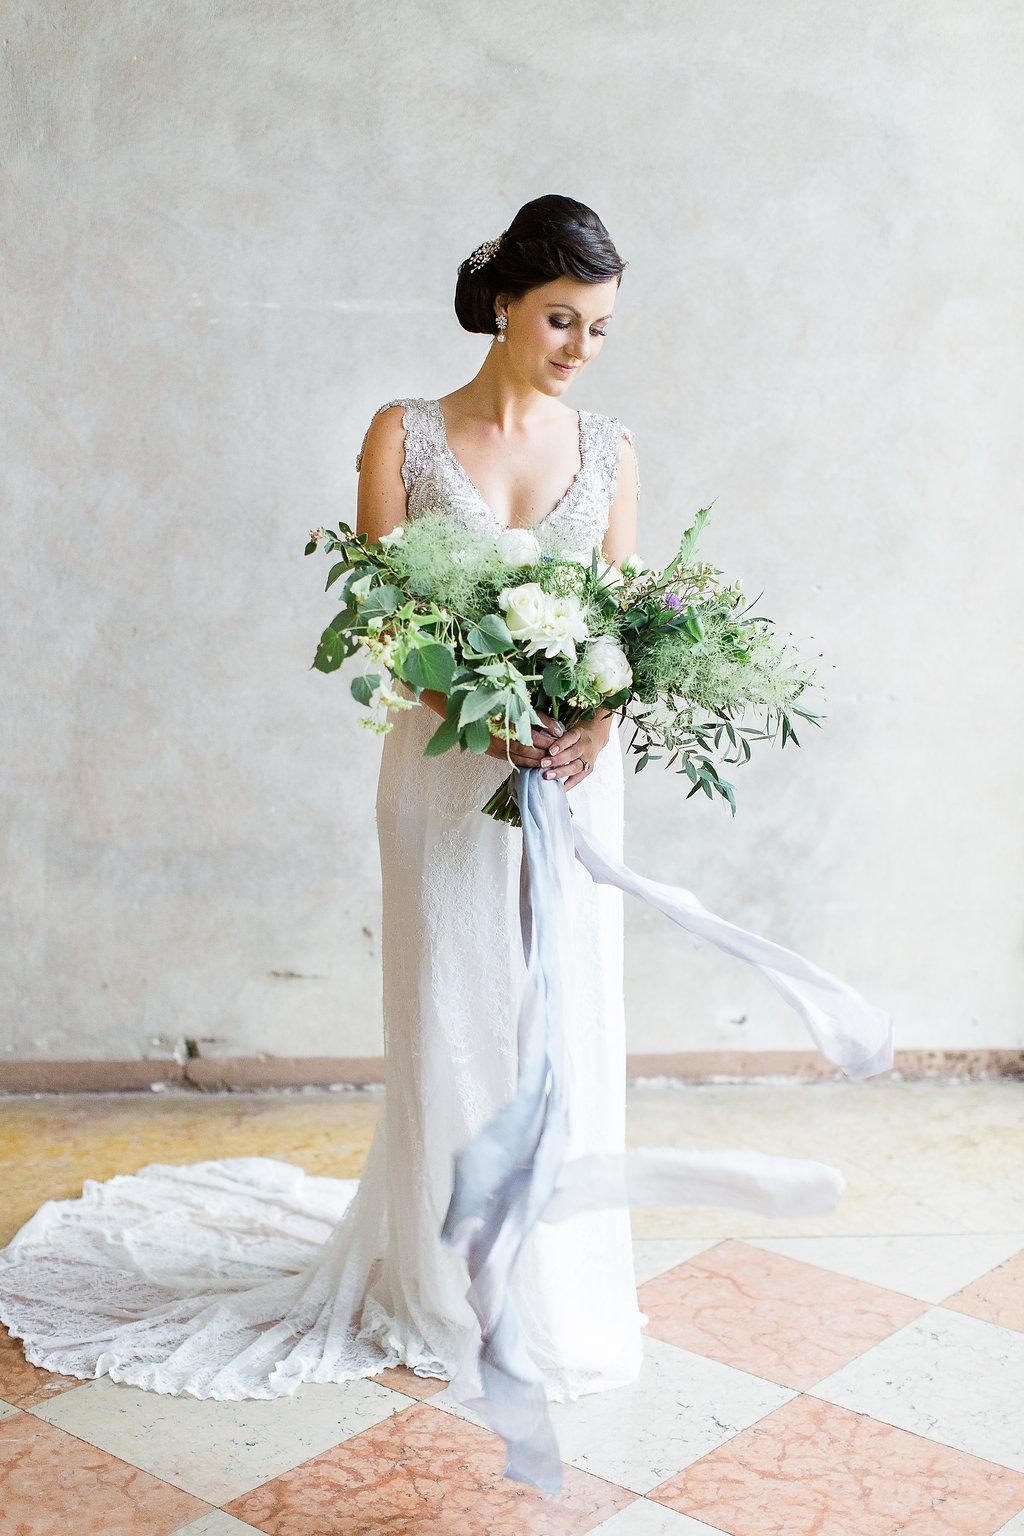 Verona-Destination-Wedding-Inspiration-by-Kibogo-Photography10.jpg